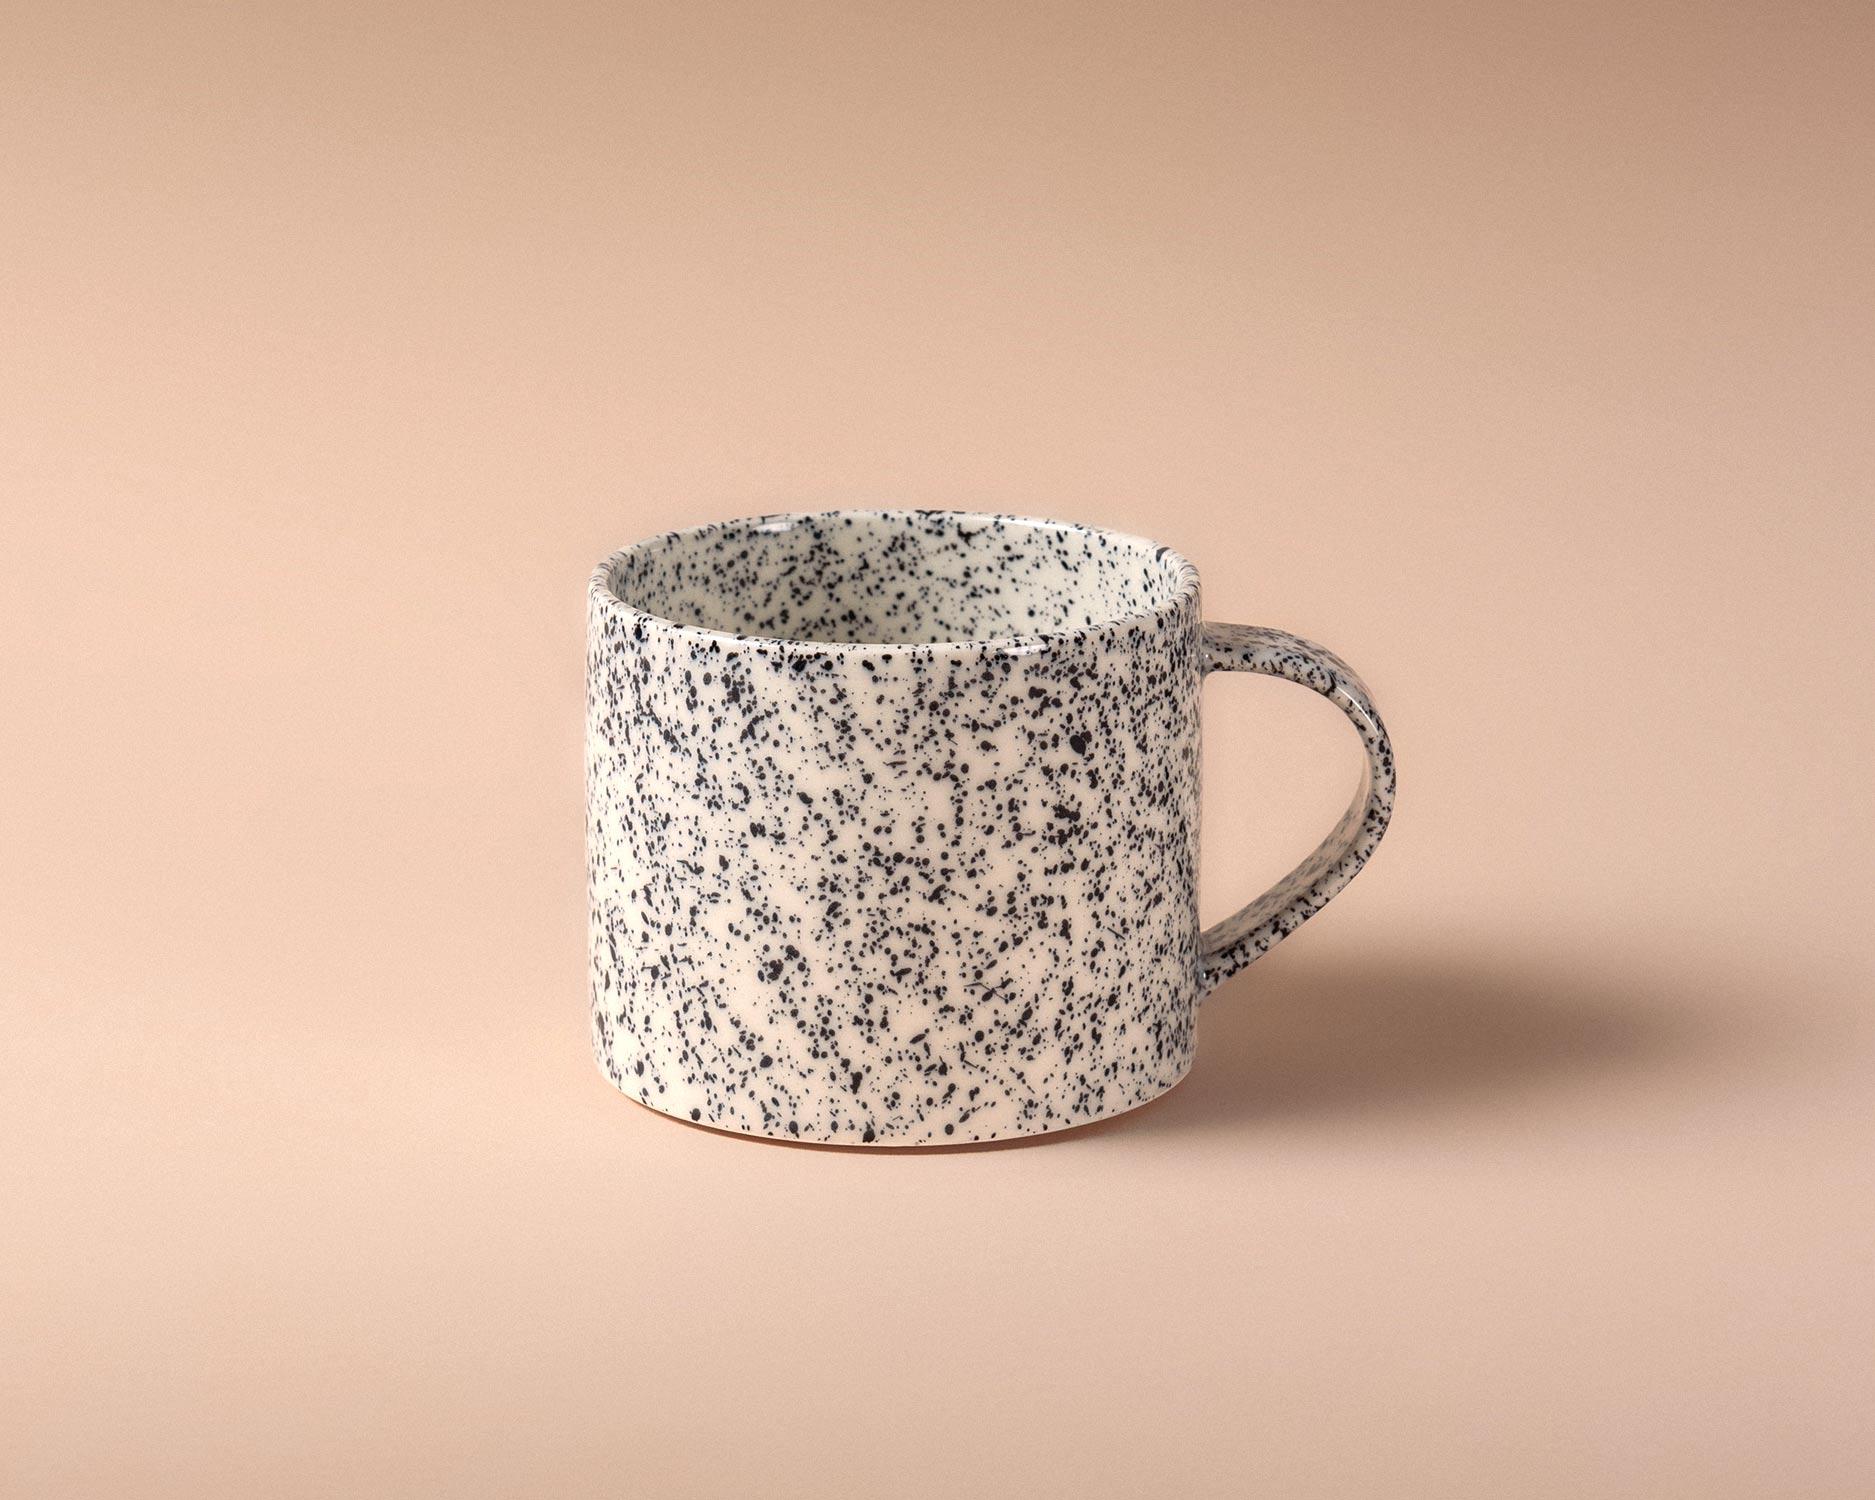 nebolusa-tea-cup-black-1-pp.jpg